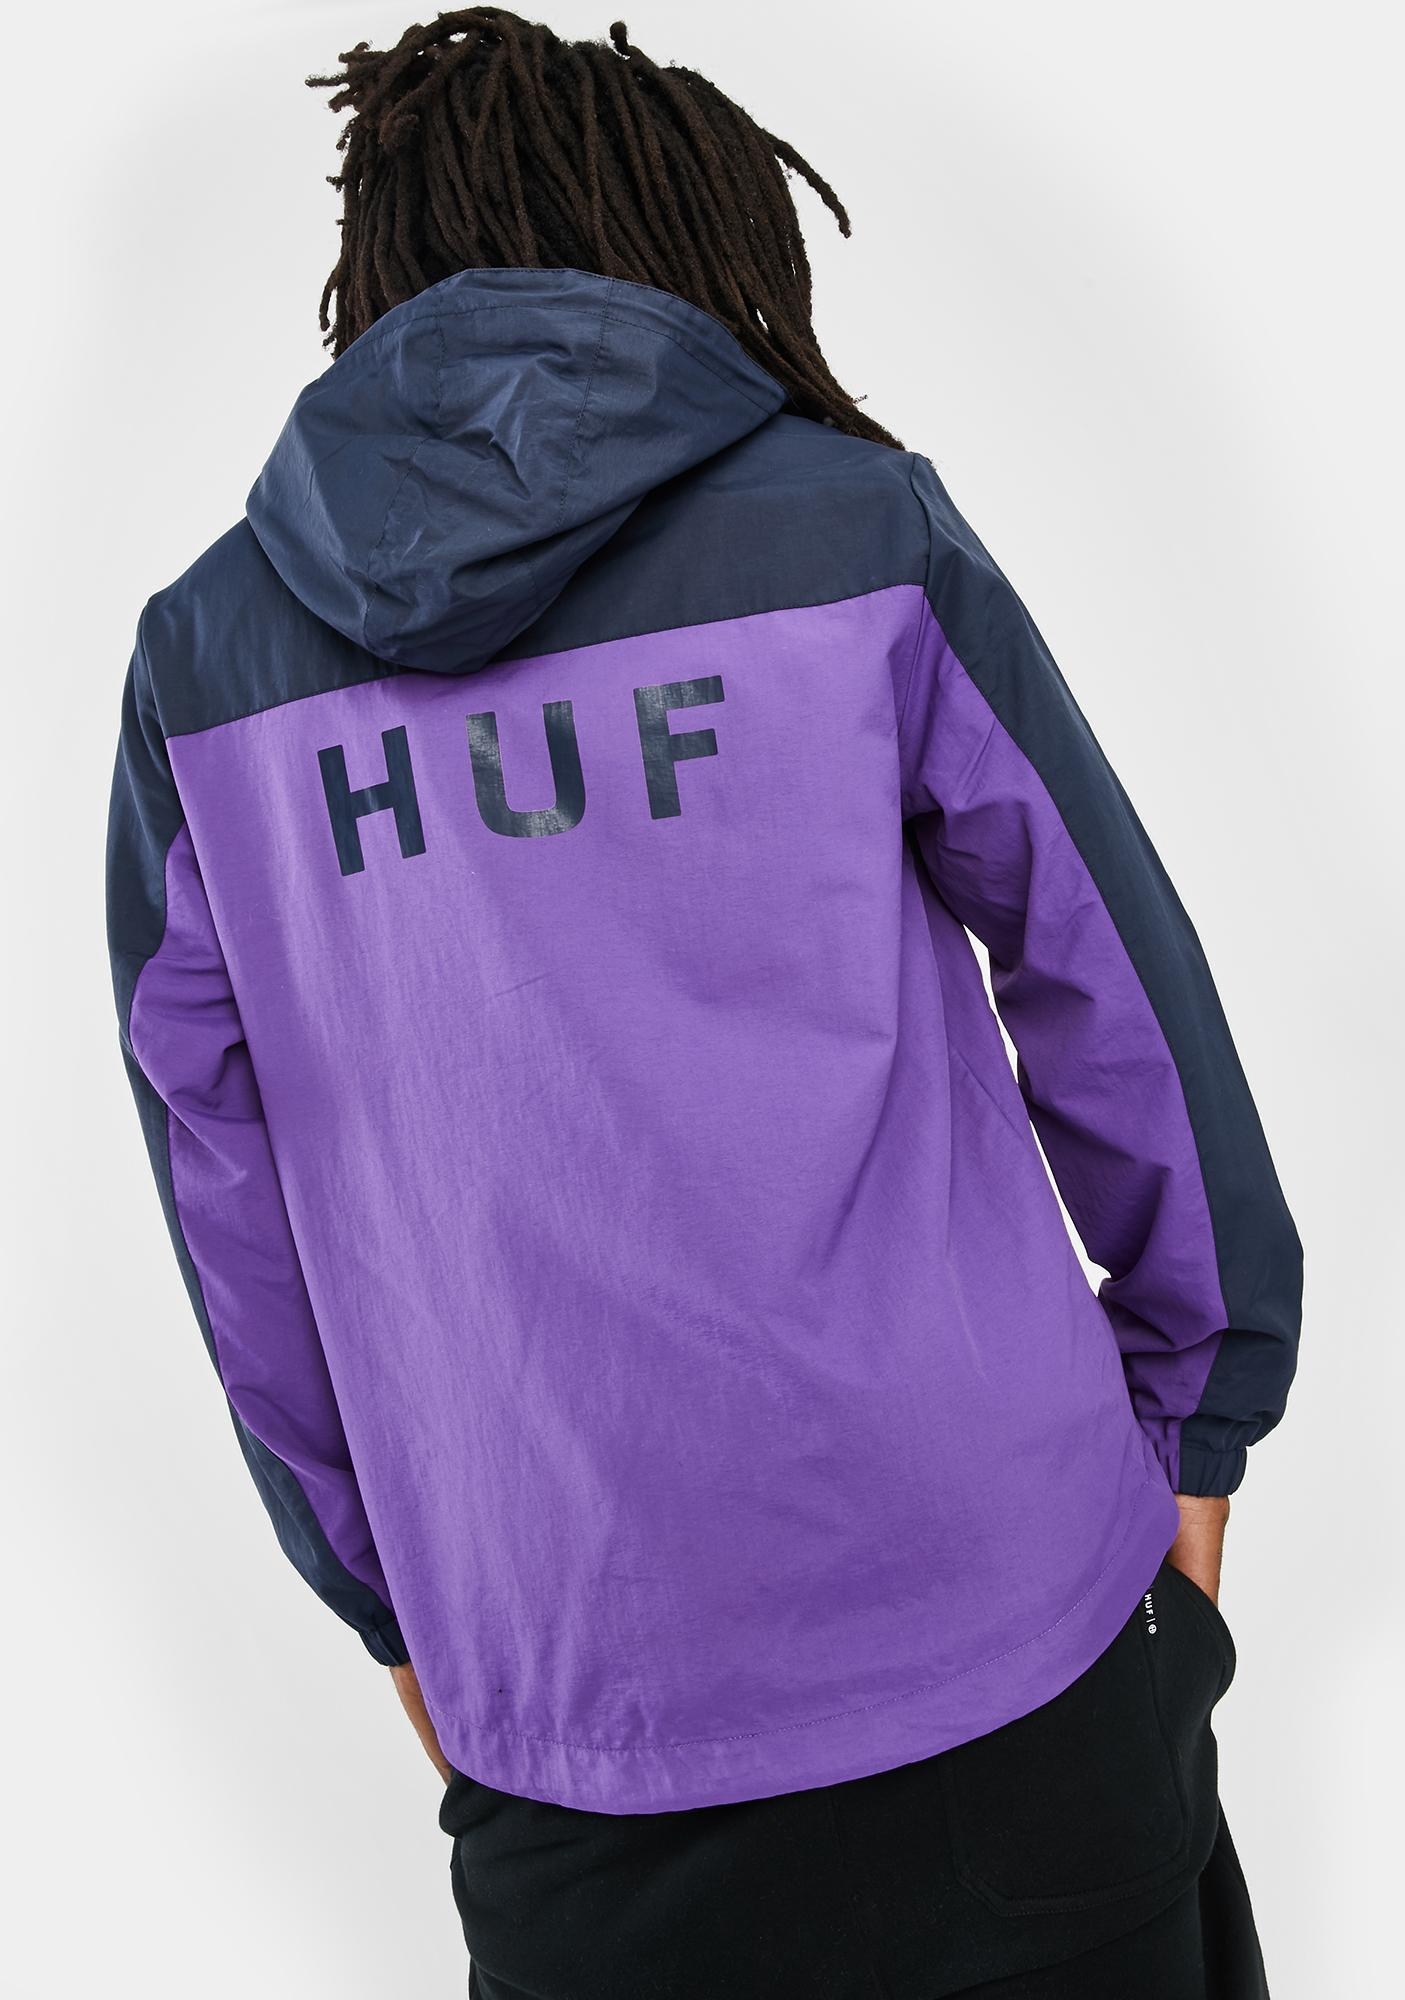 HUF Standard Shell 3 Jacket